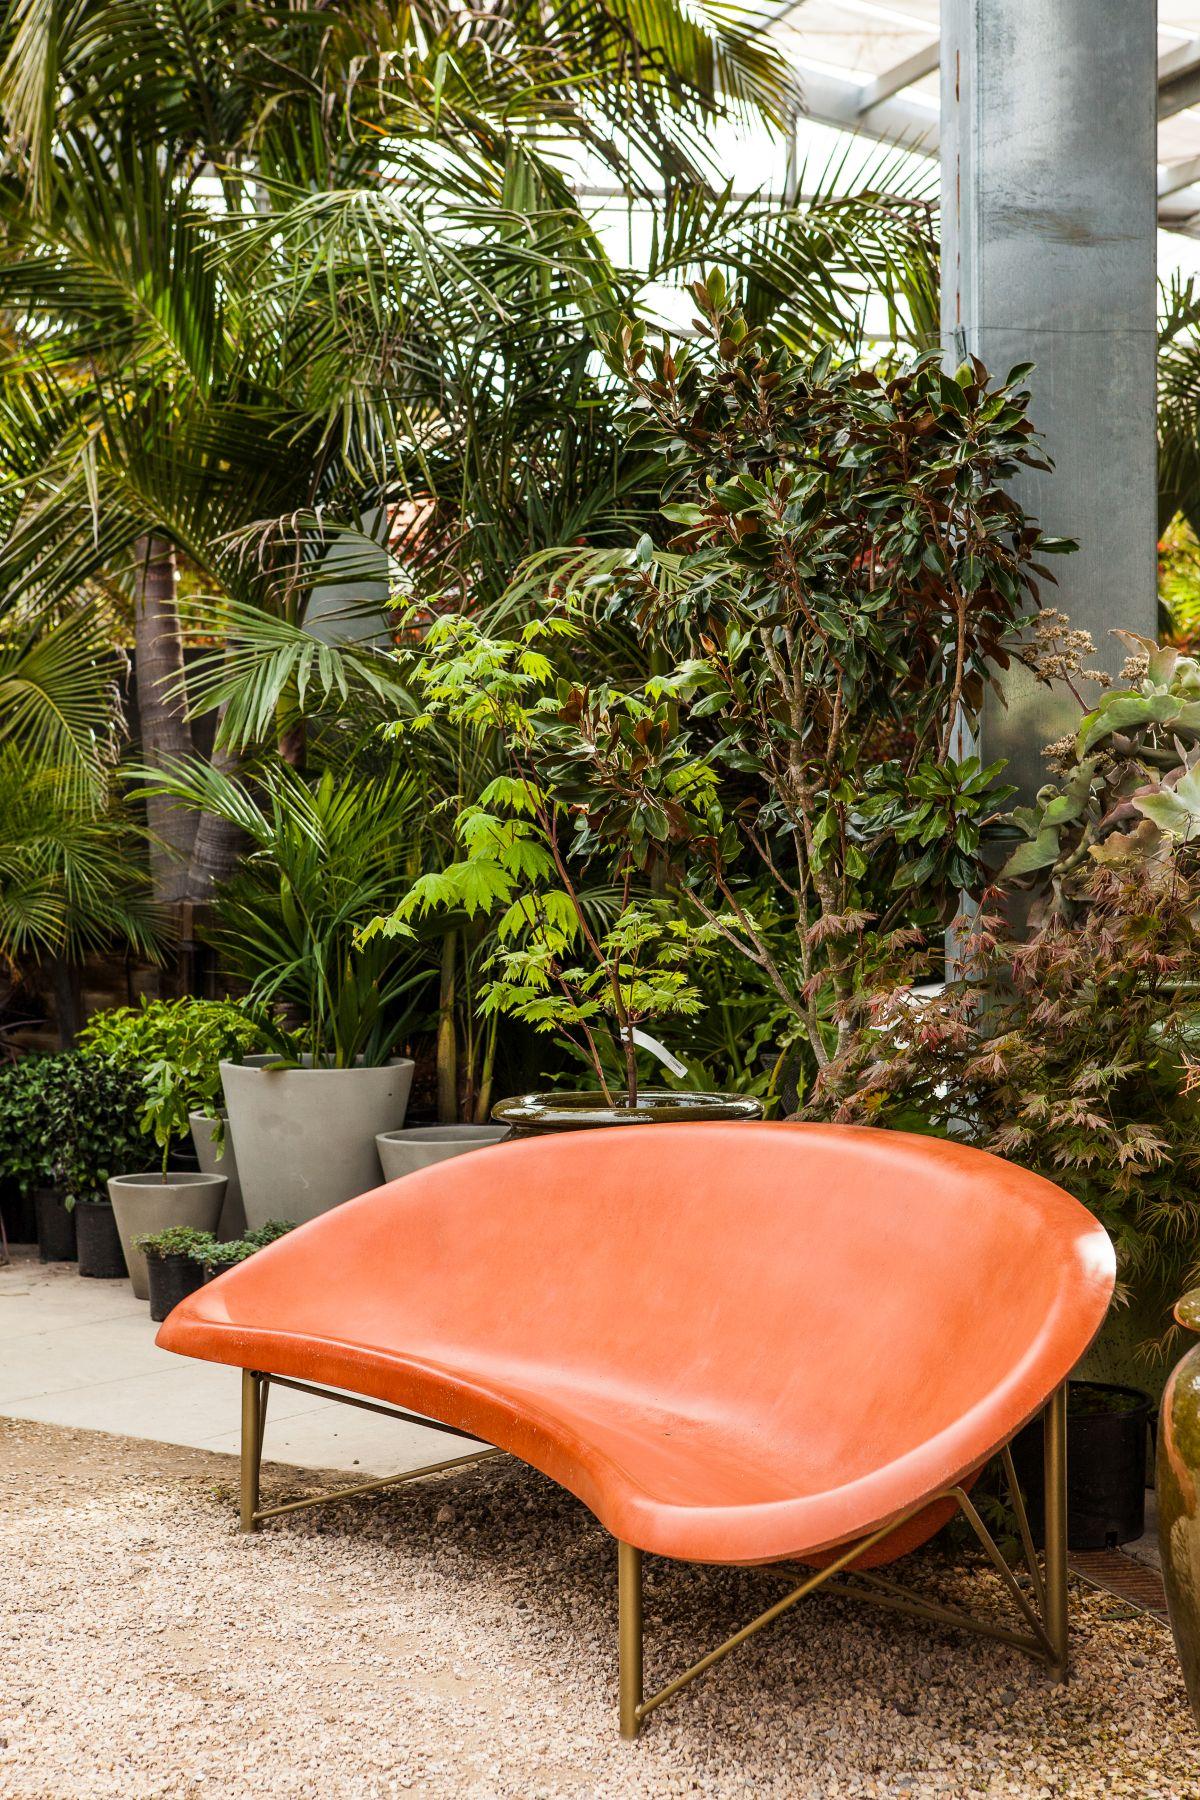 Orange heating seating with a lush vegetation behind